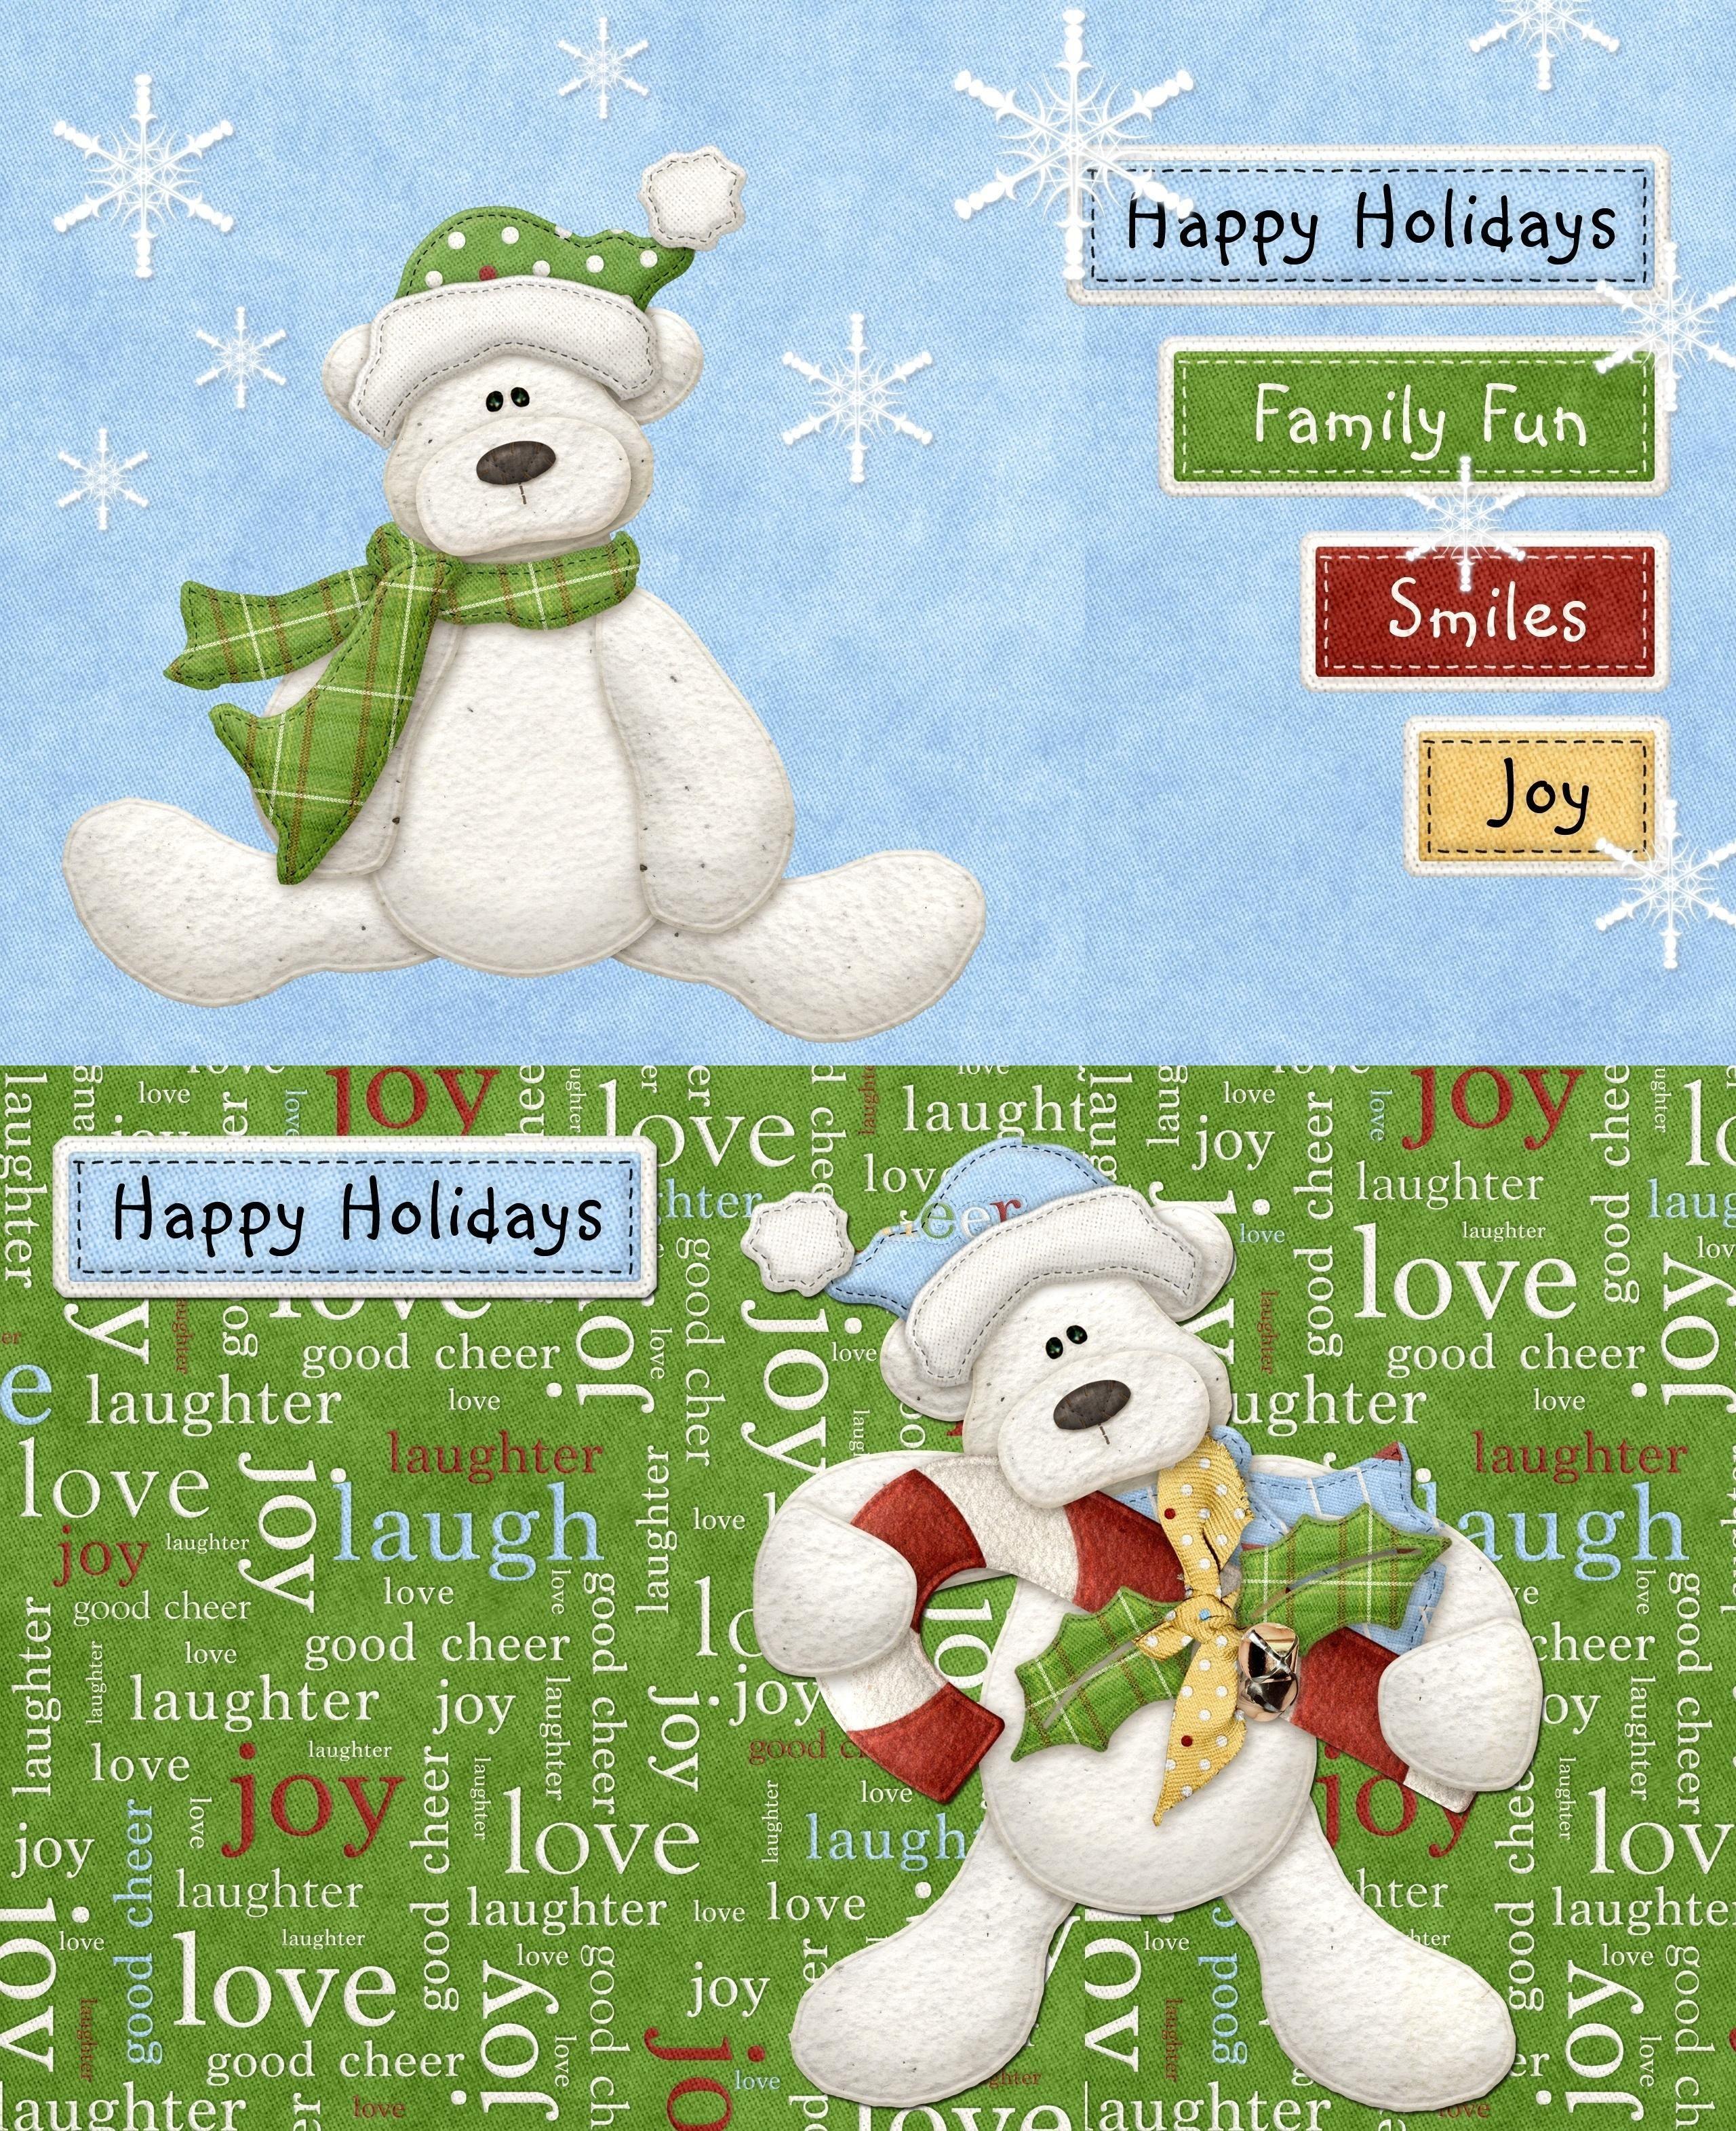 Happy Holidays Phone Desktop Wallpaper Backgrounds Pinterest